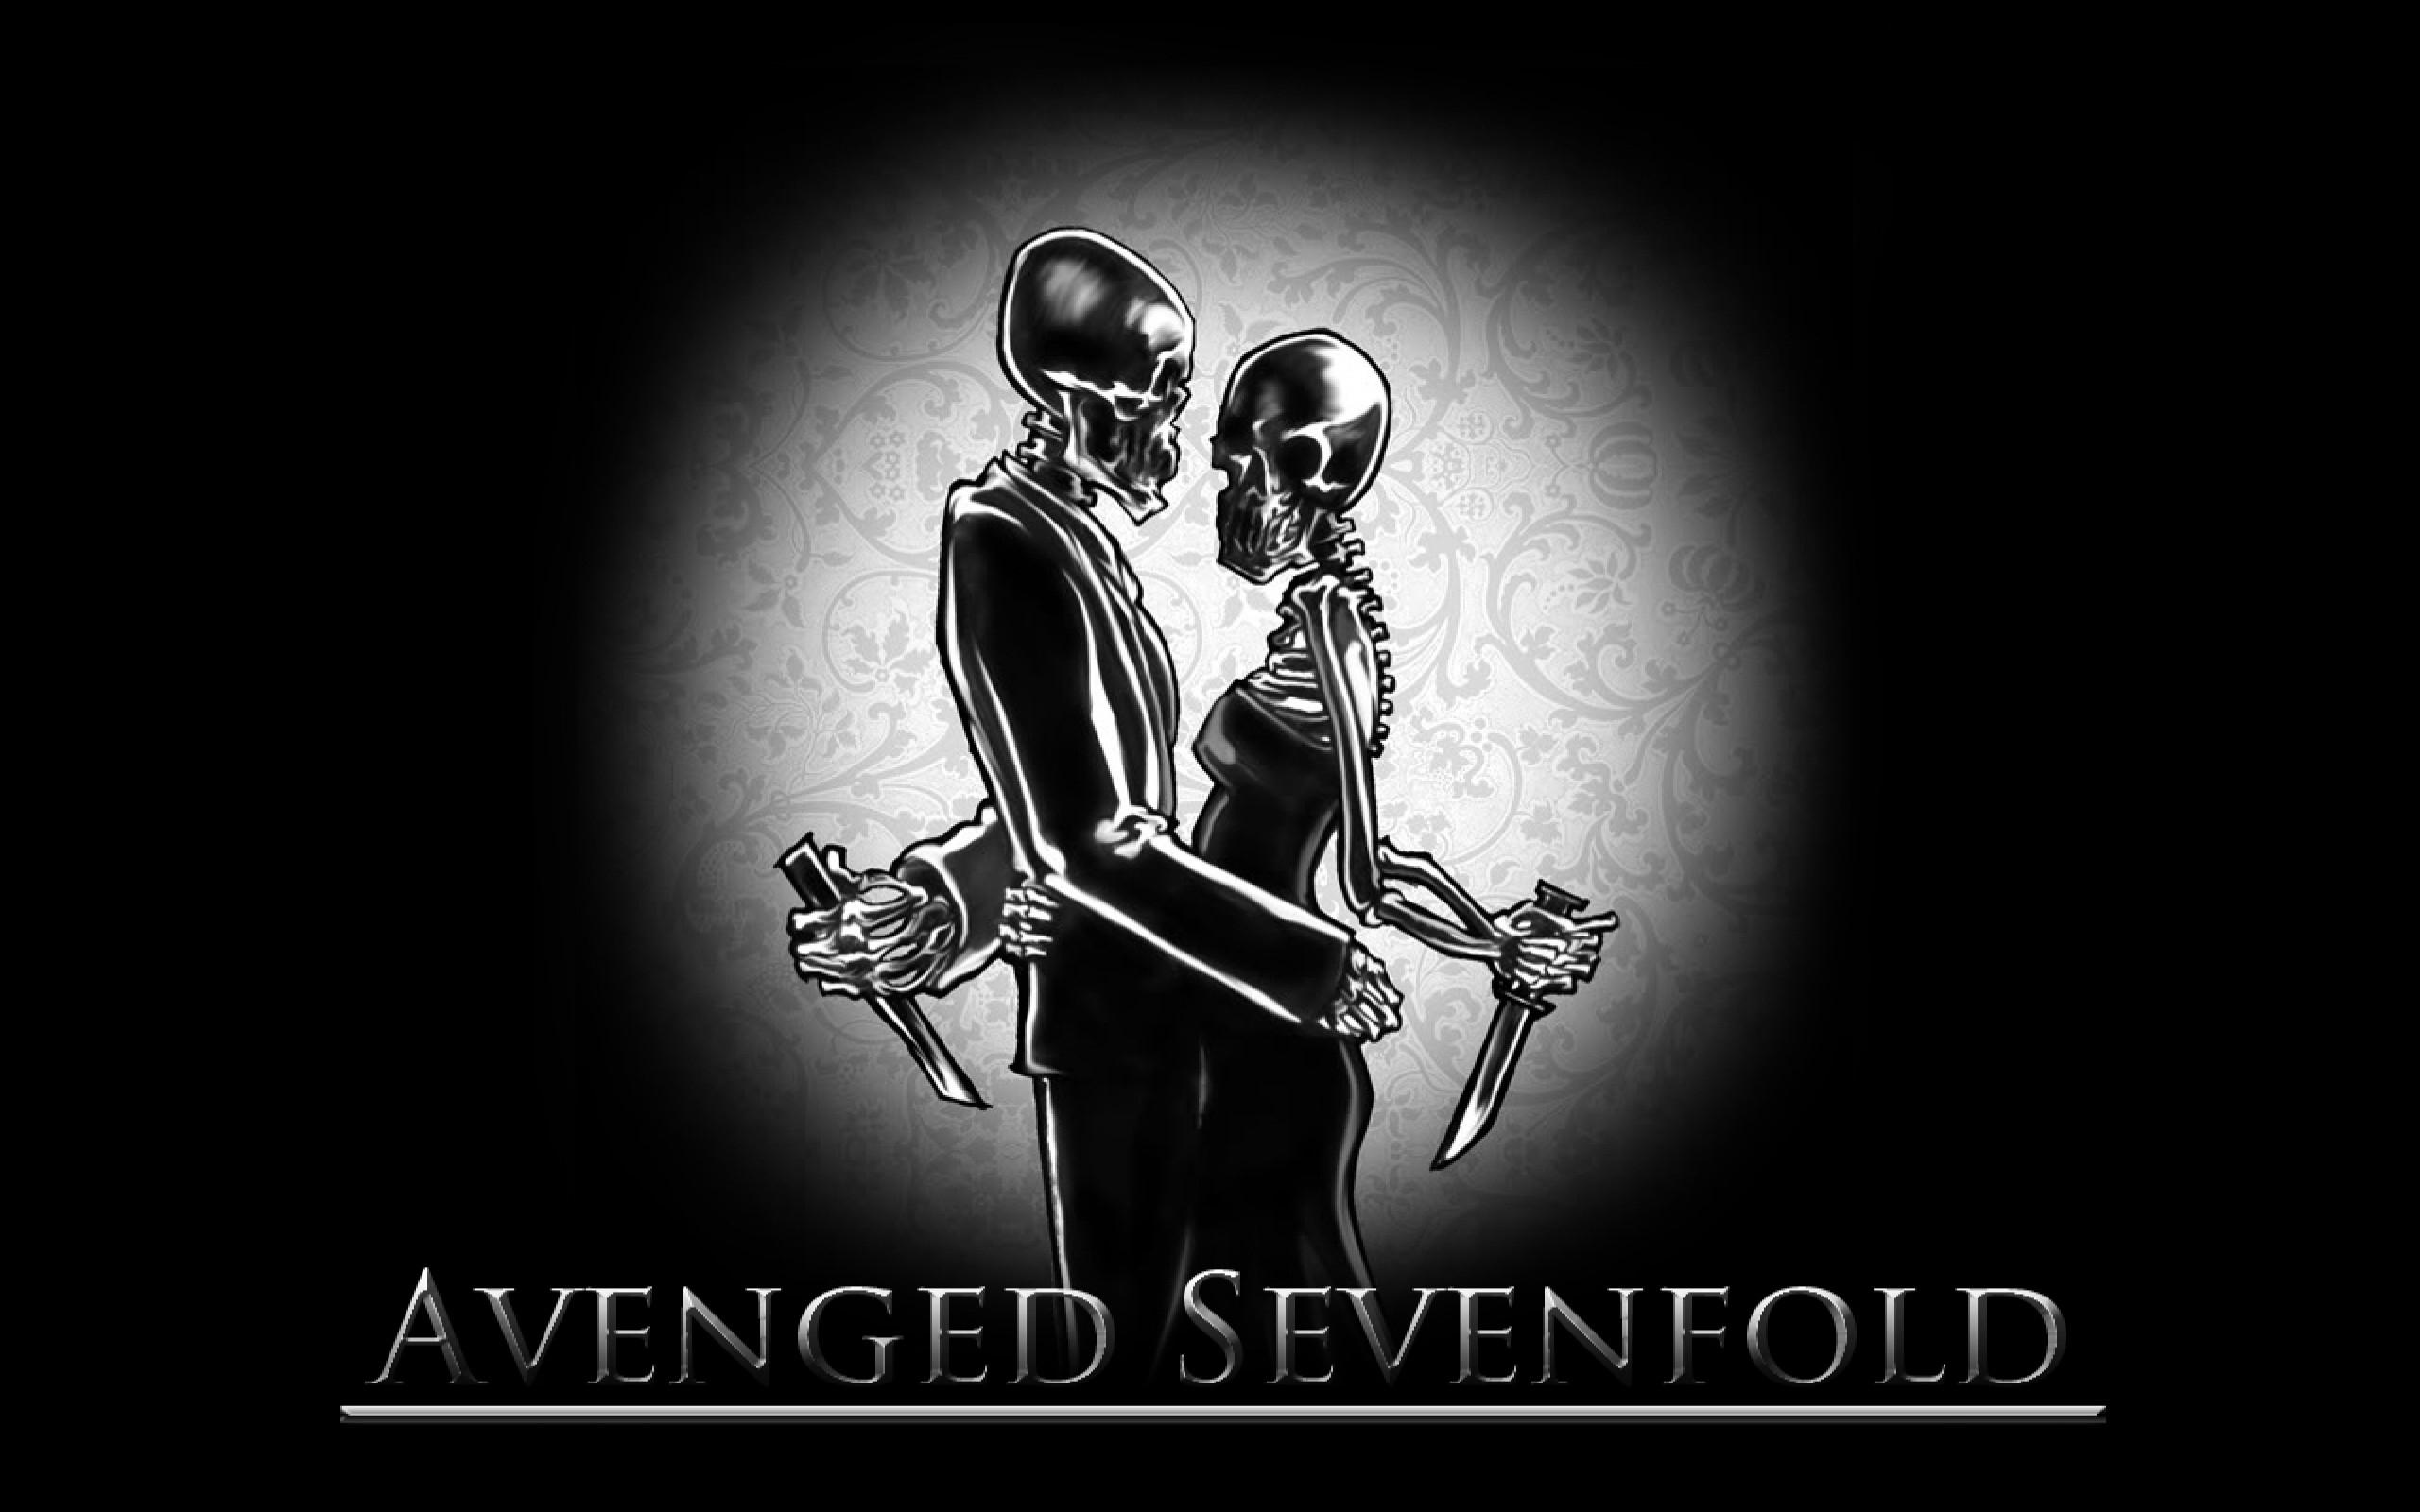 Wallpapers A Little Piece Of Heaven Avenged Sevenfold Hd Parte .